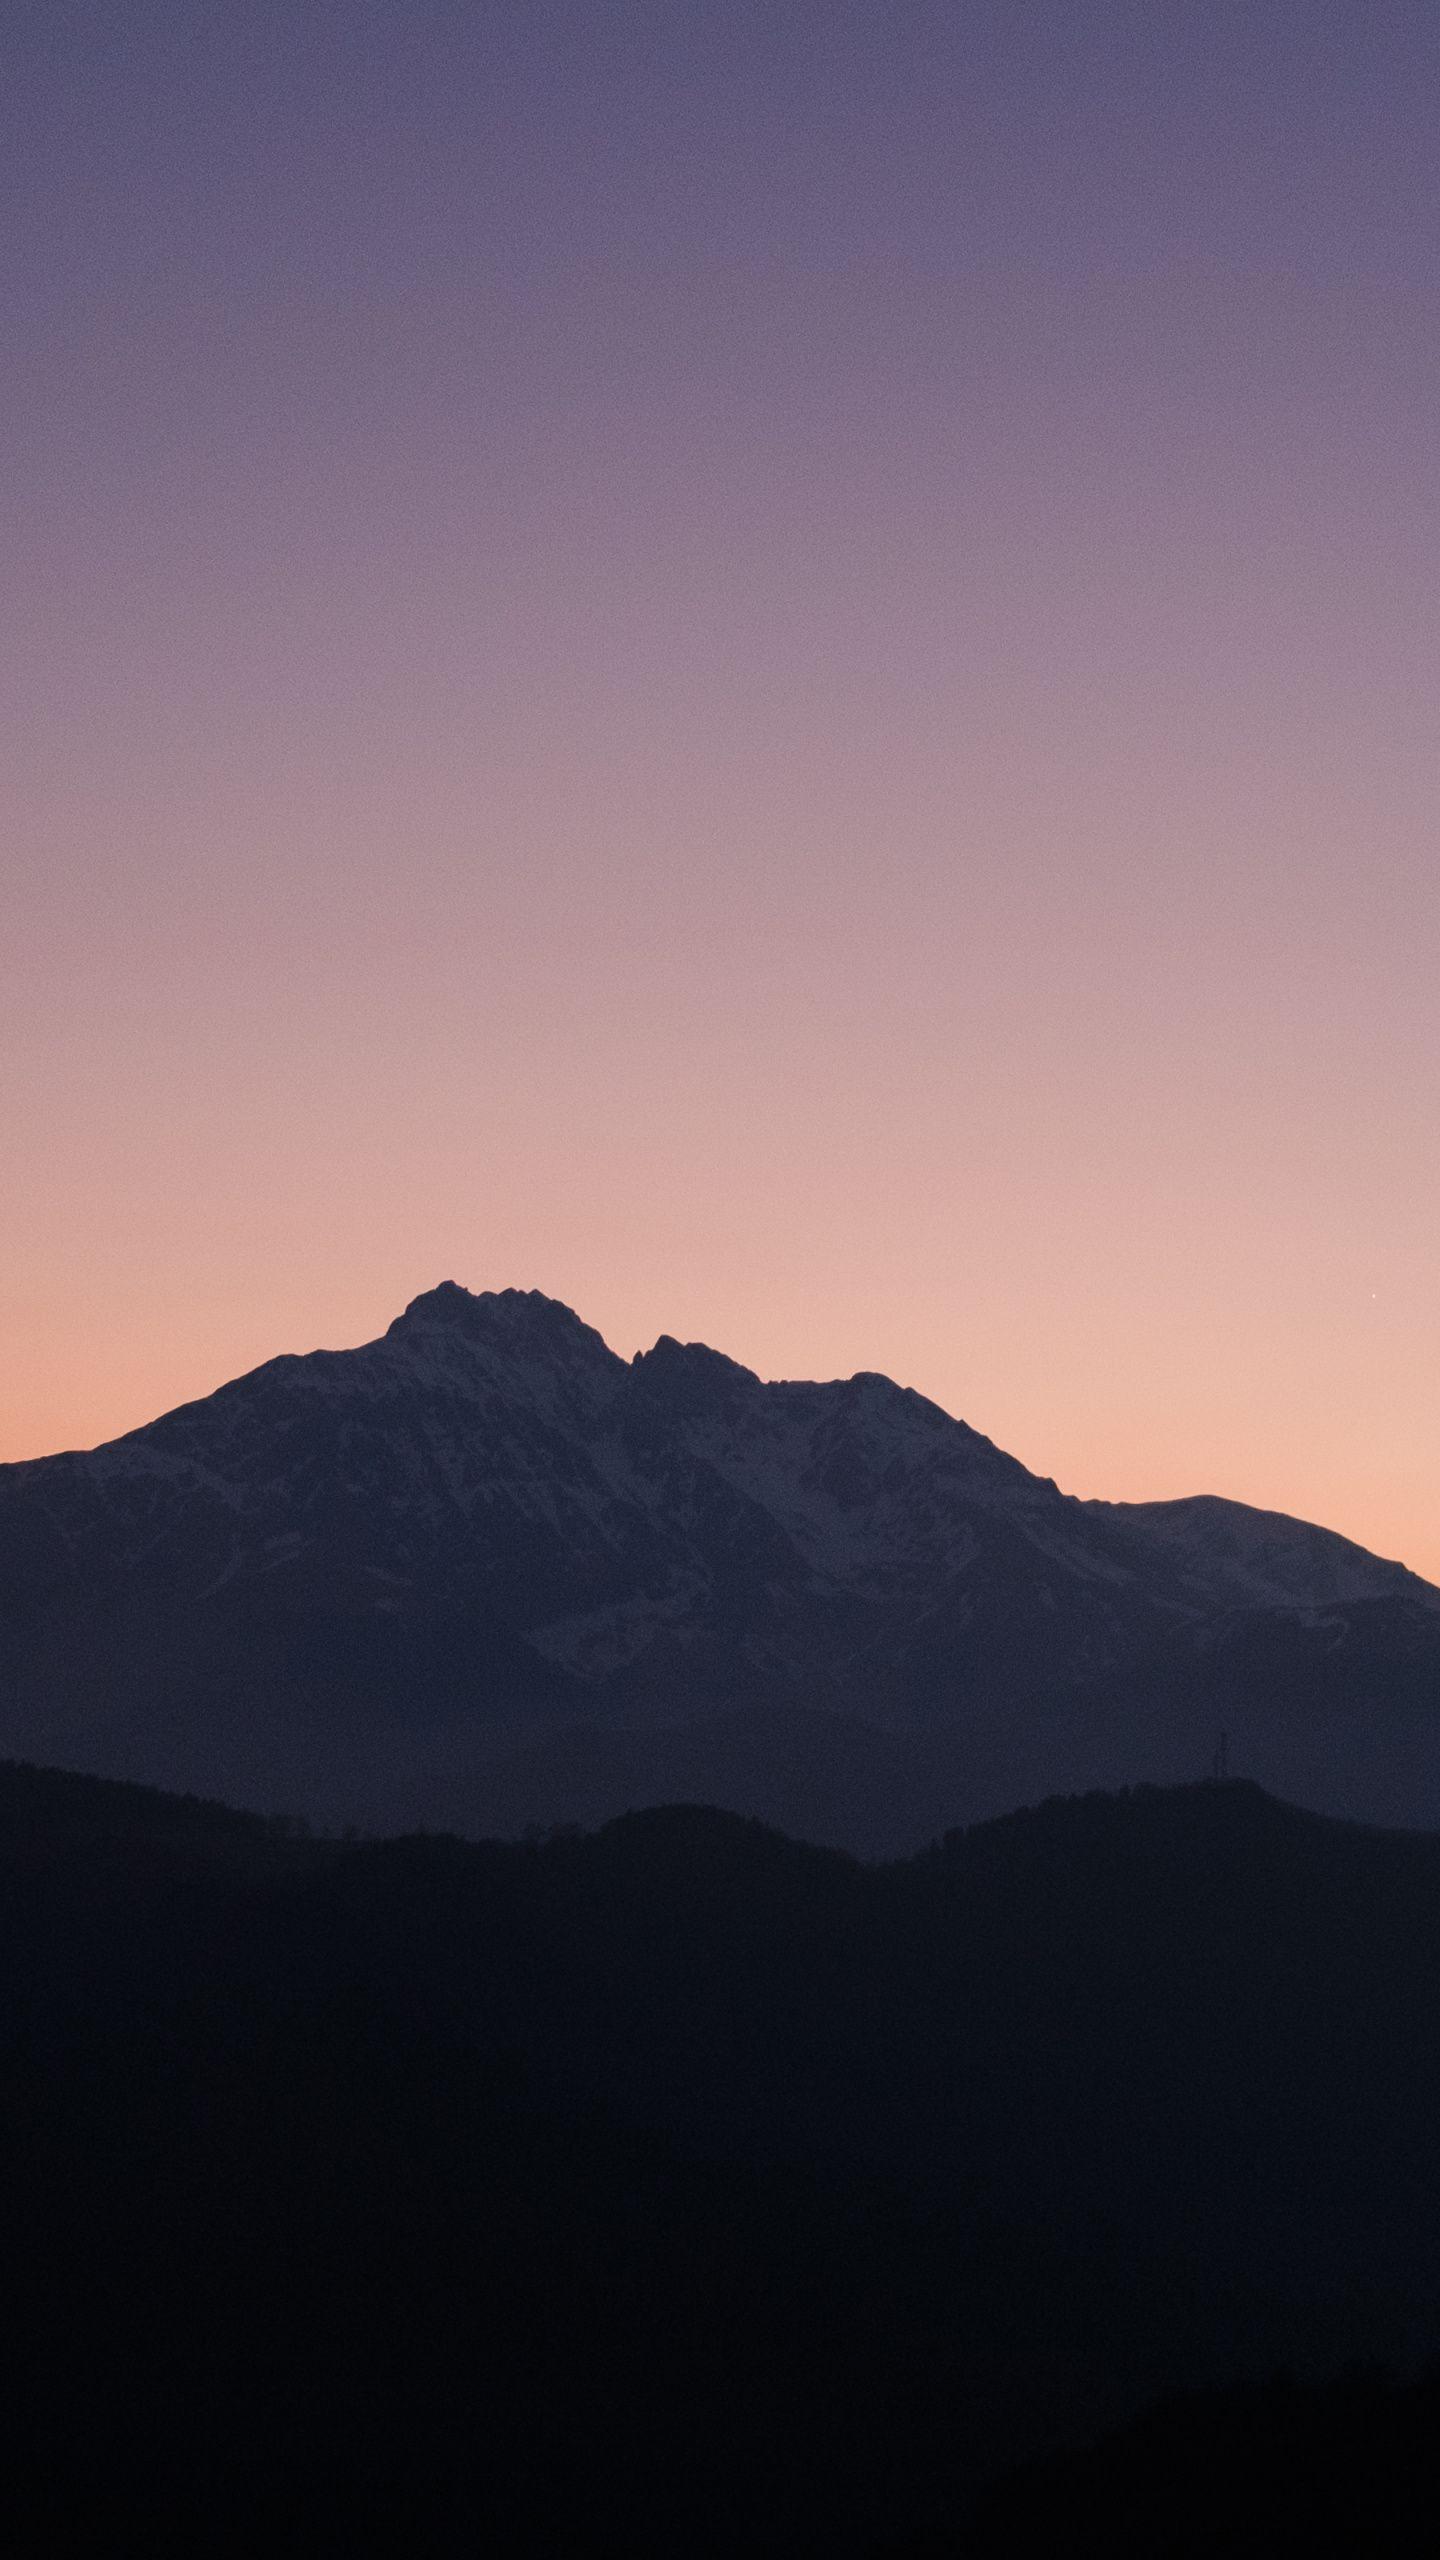 1440x2560 Sunset Mountains Dusk Horizon Silhouette Wallpaper